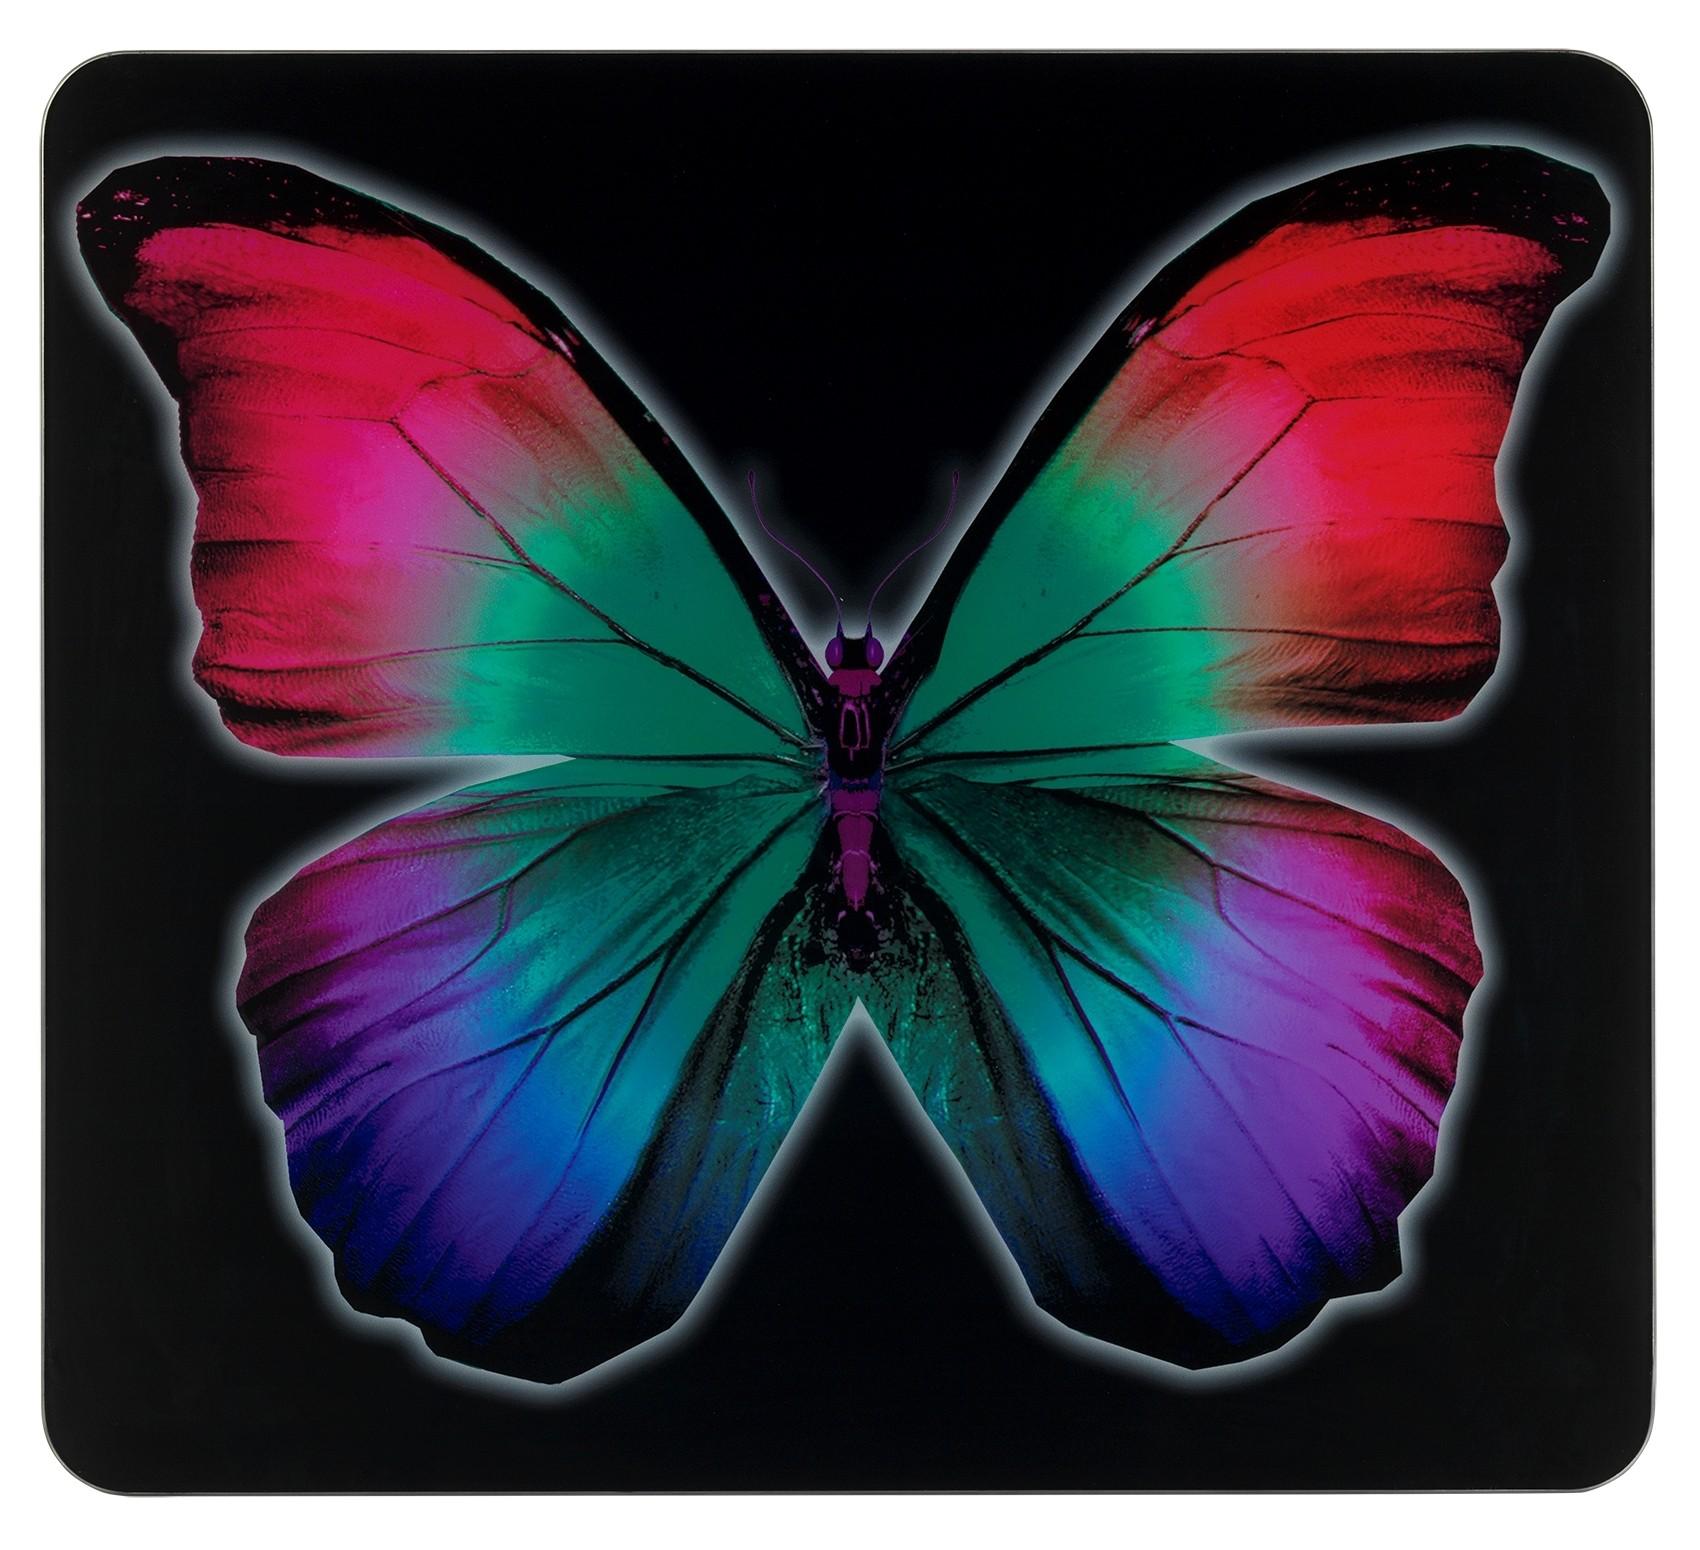 Wenko Multi-Platte Butterfly by Night, für Glaskeramik Kochfelder